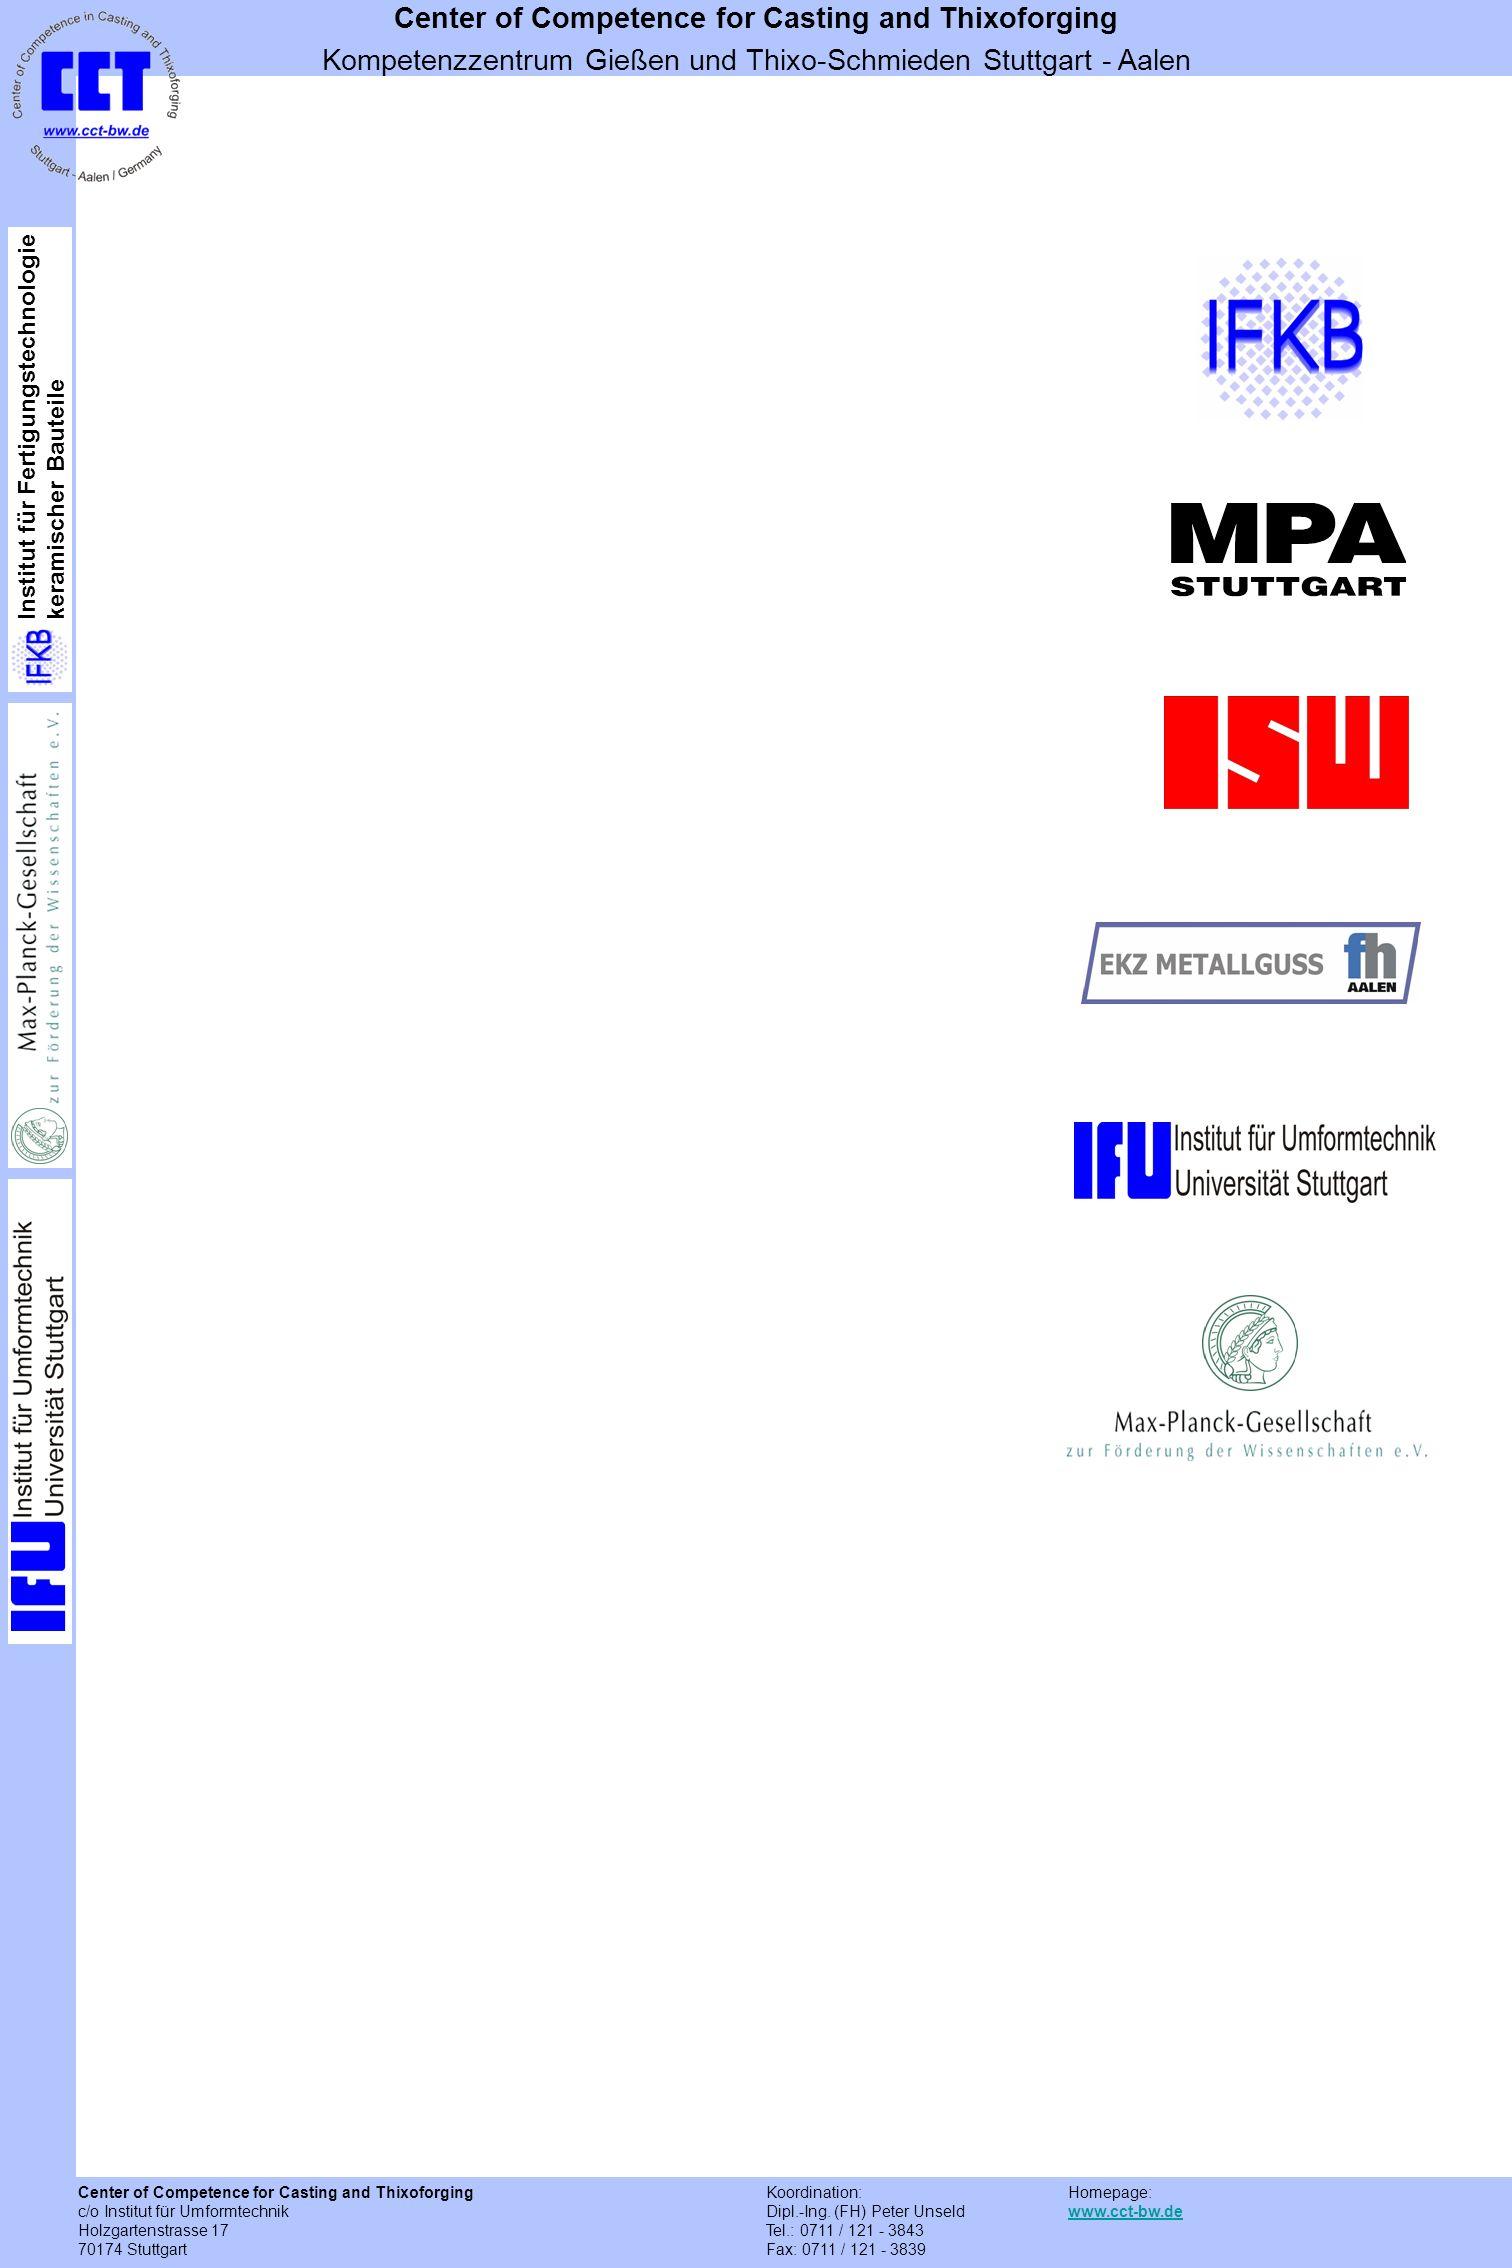 Center of Competence for Casting and Thixoforging c/o Institut für Umformtechnik Holzgartenstrasse 17 70174 Stuttgart Koordination: Dipl.-Ing. (FH) Pe